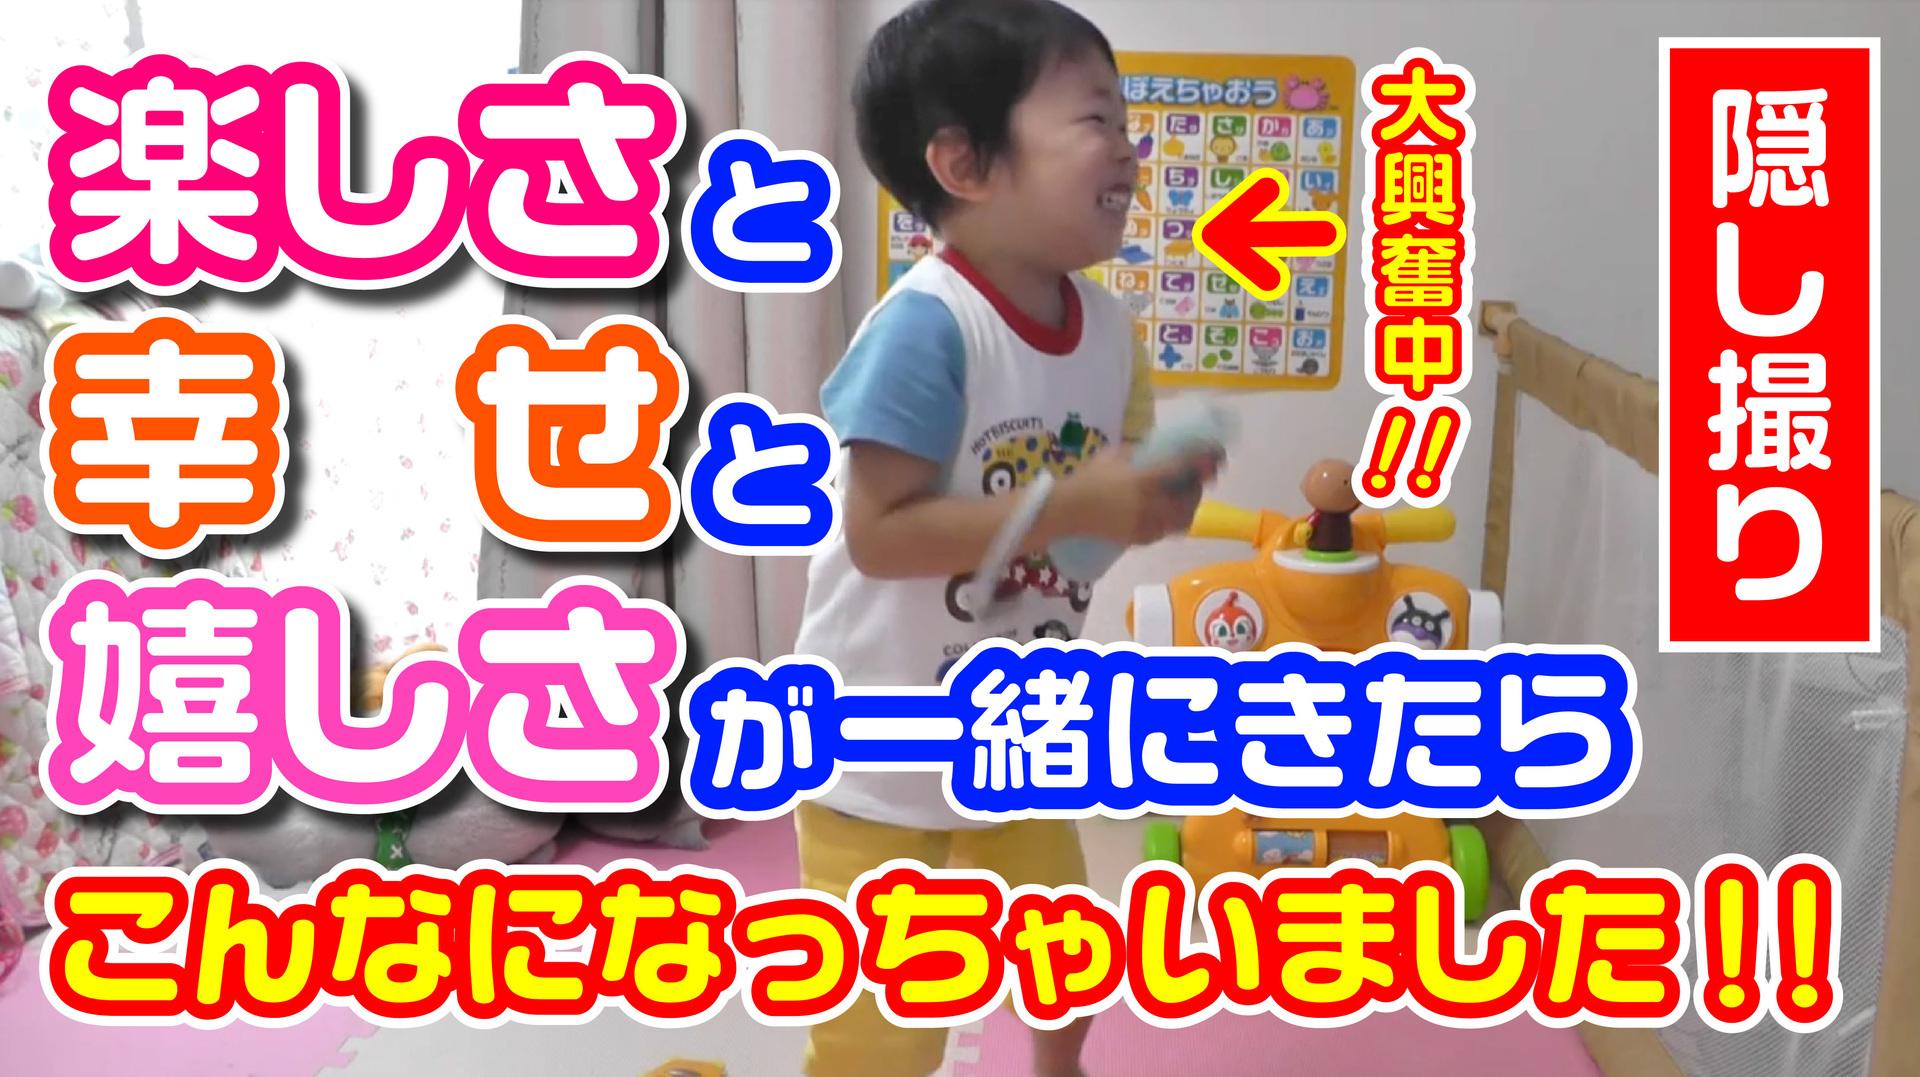 Youtubeサムネイル WiiUチャンバラ.jpg